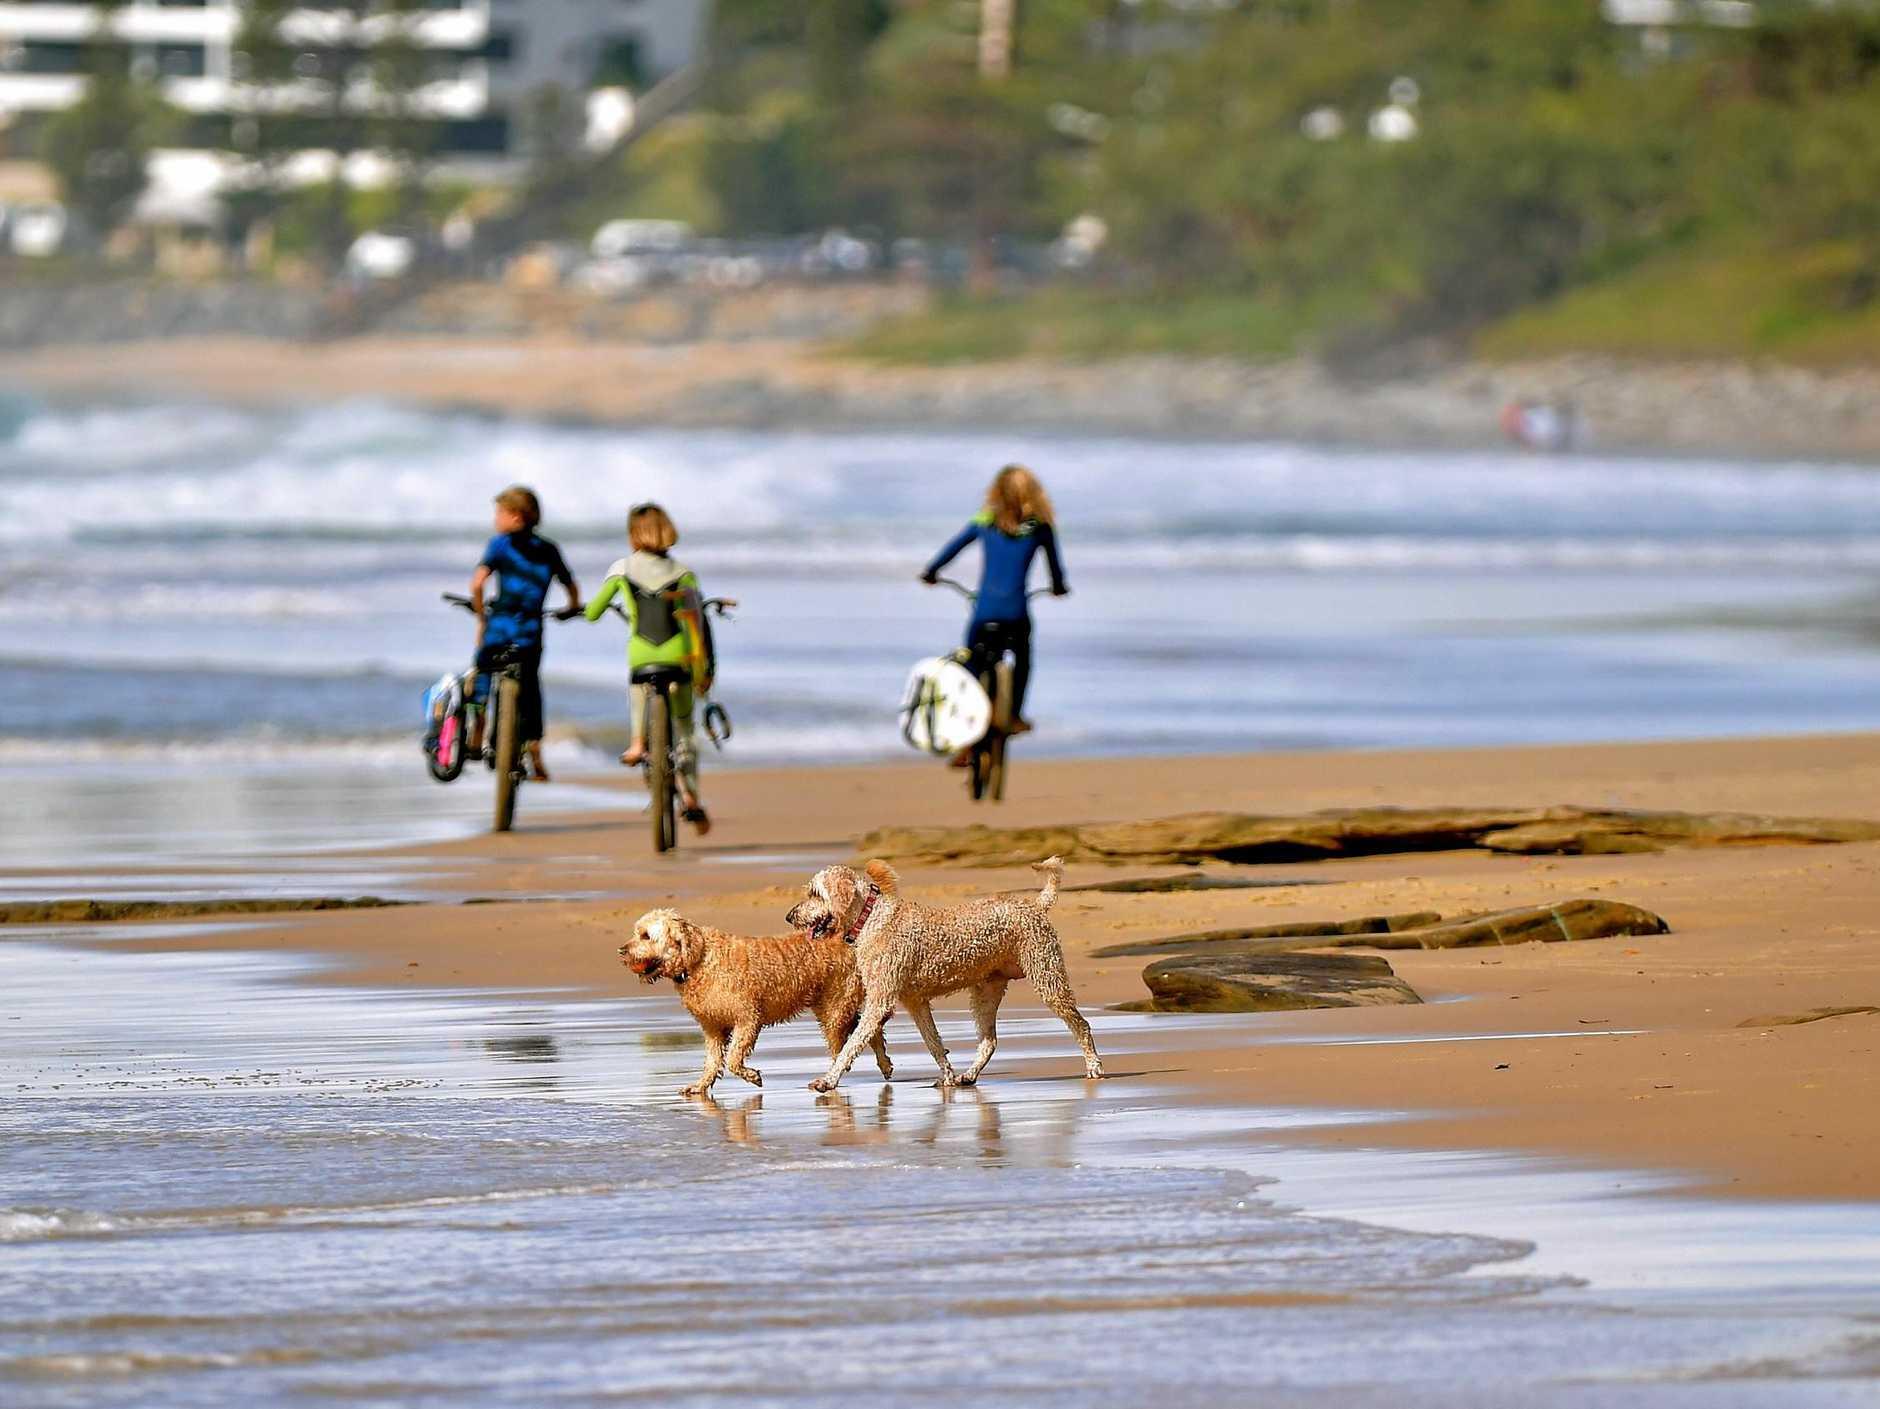 Dogs play on the beach.